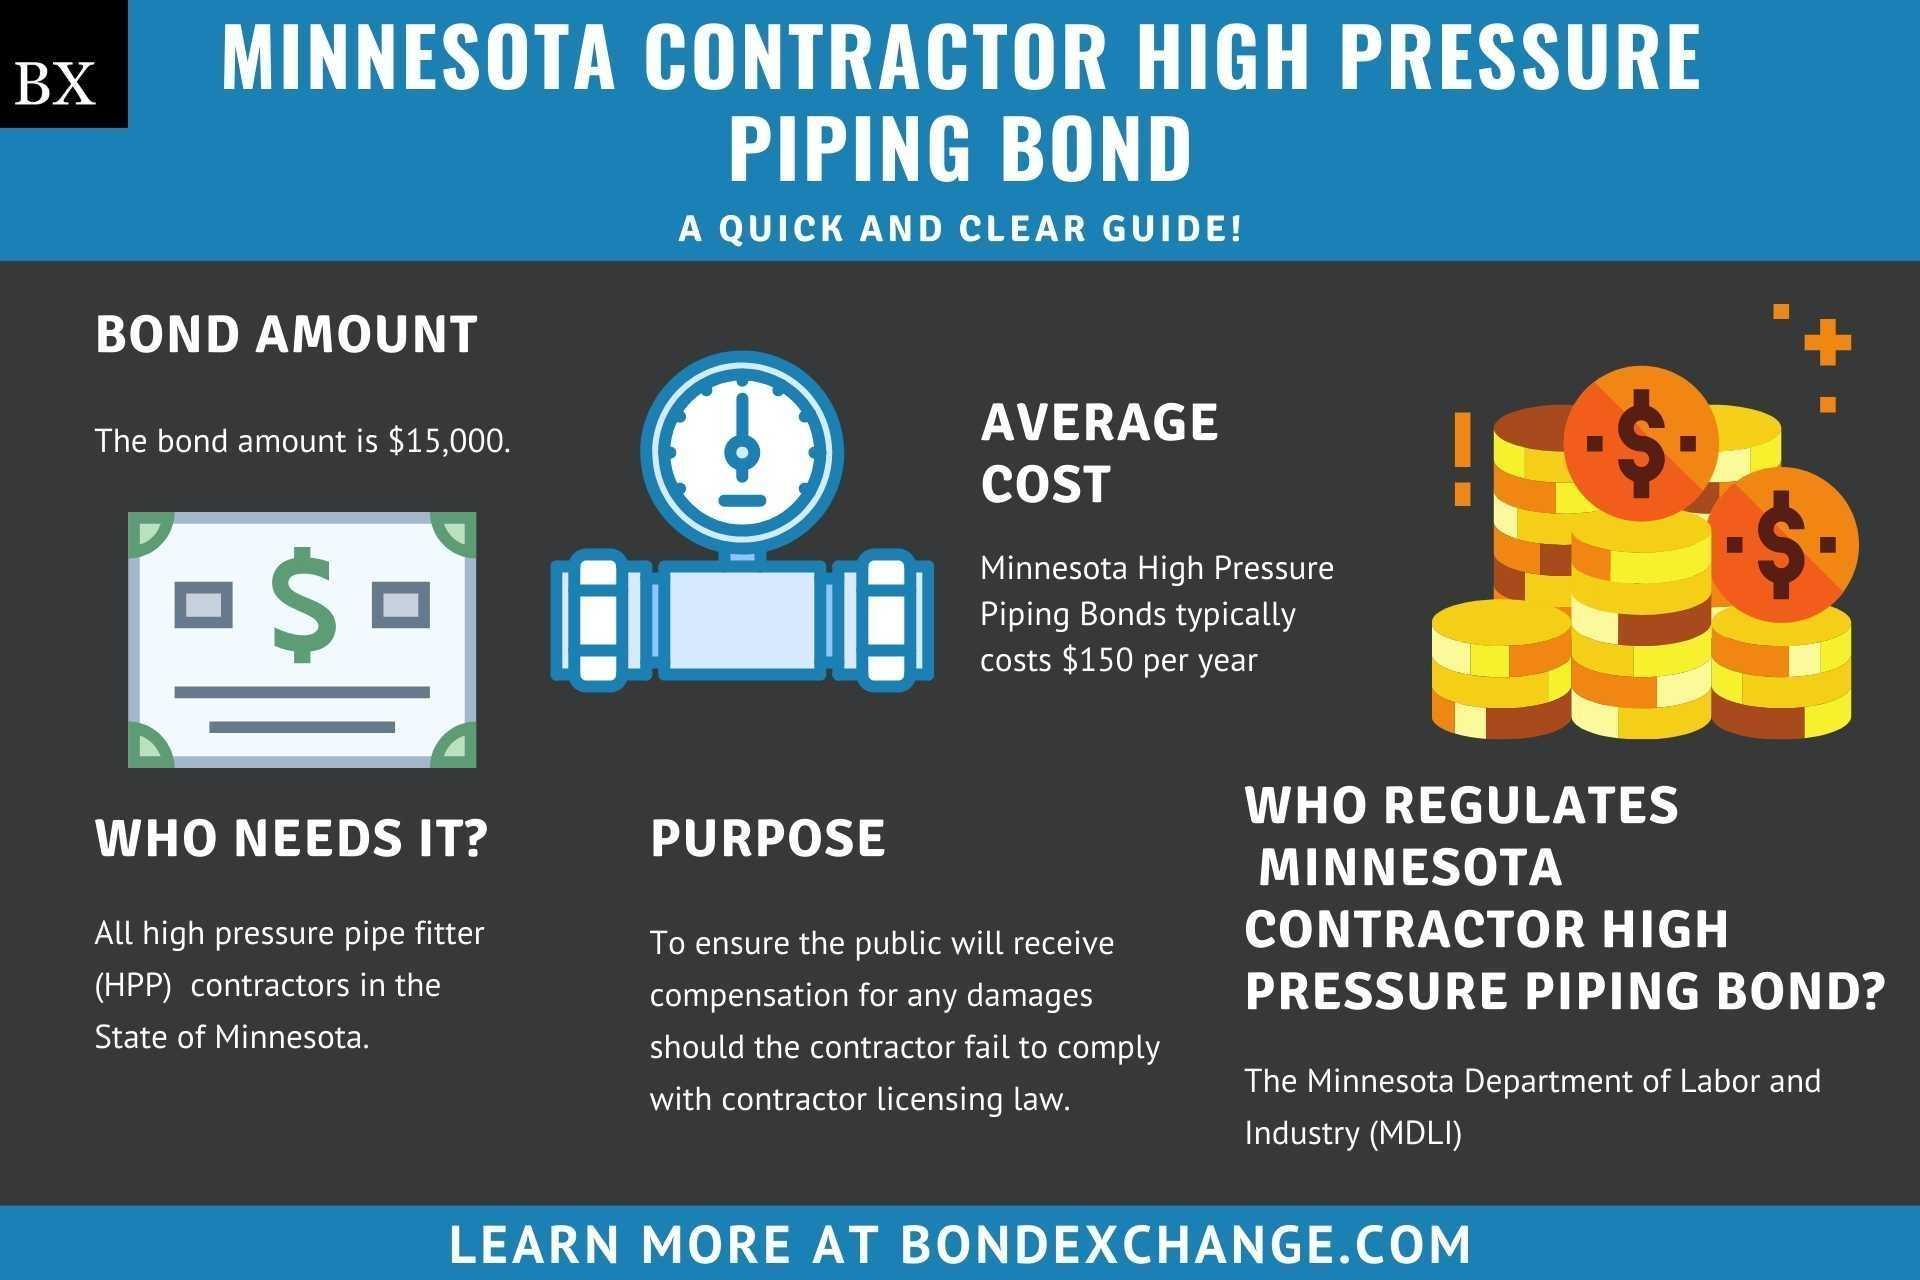 Minnesota High Pressure Piping Bond